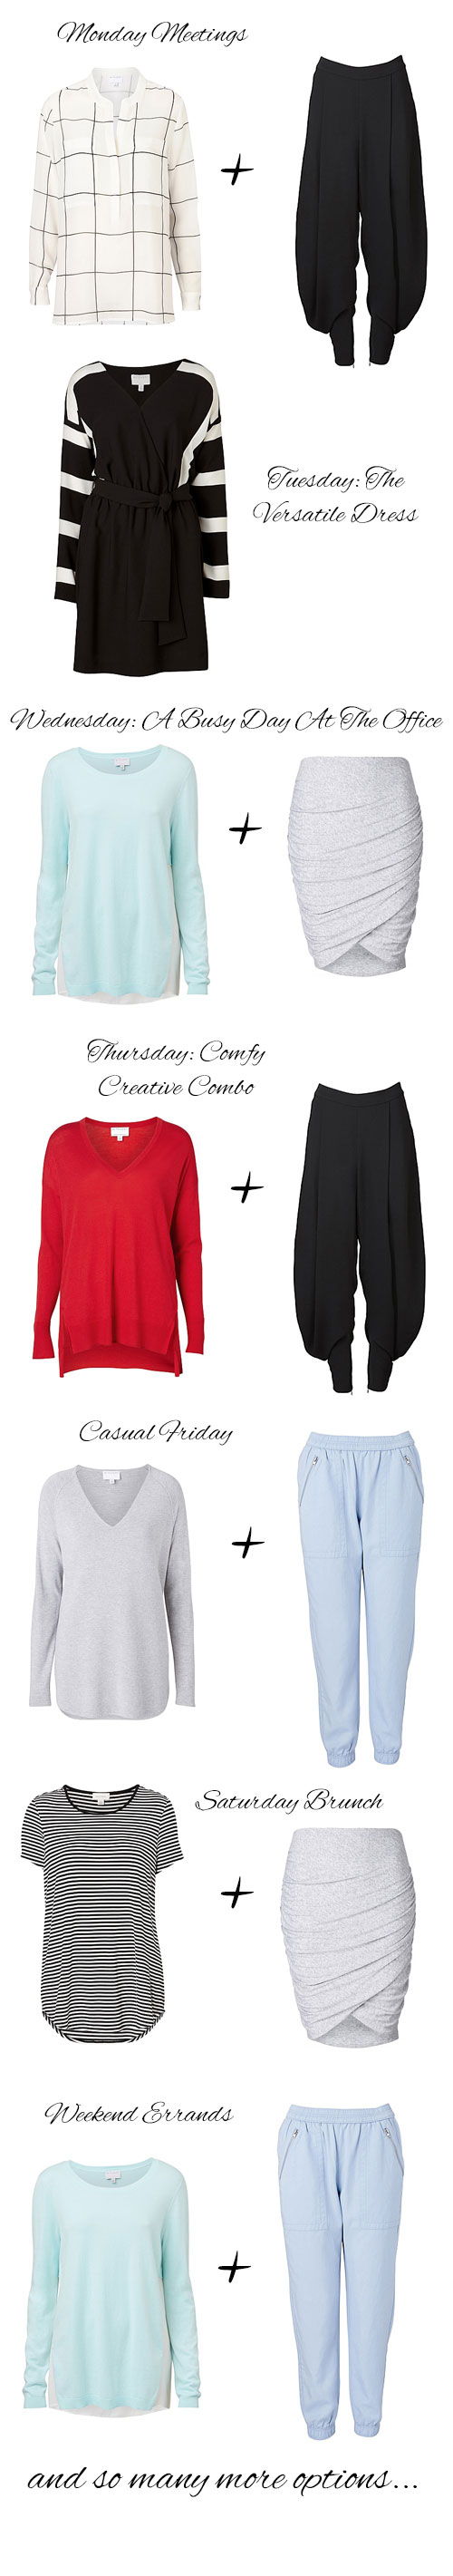 Spring Capsule Wardrobe Outfits | EmmaLouisa.com